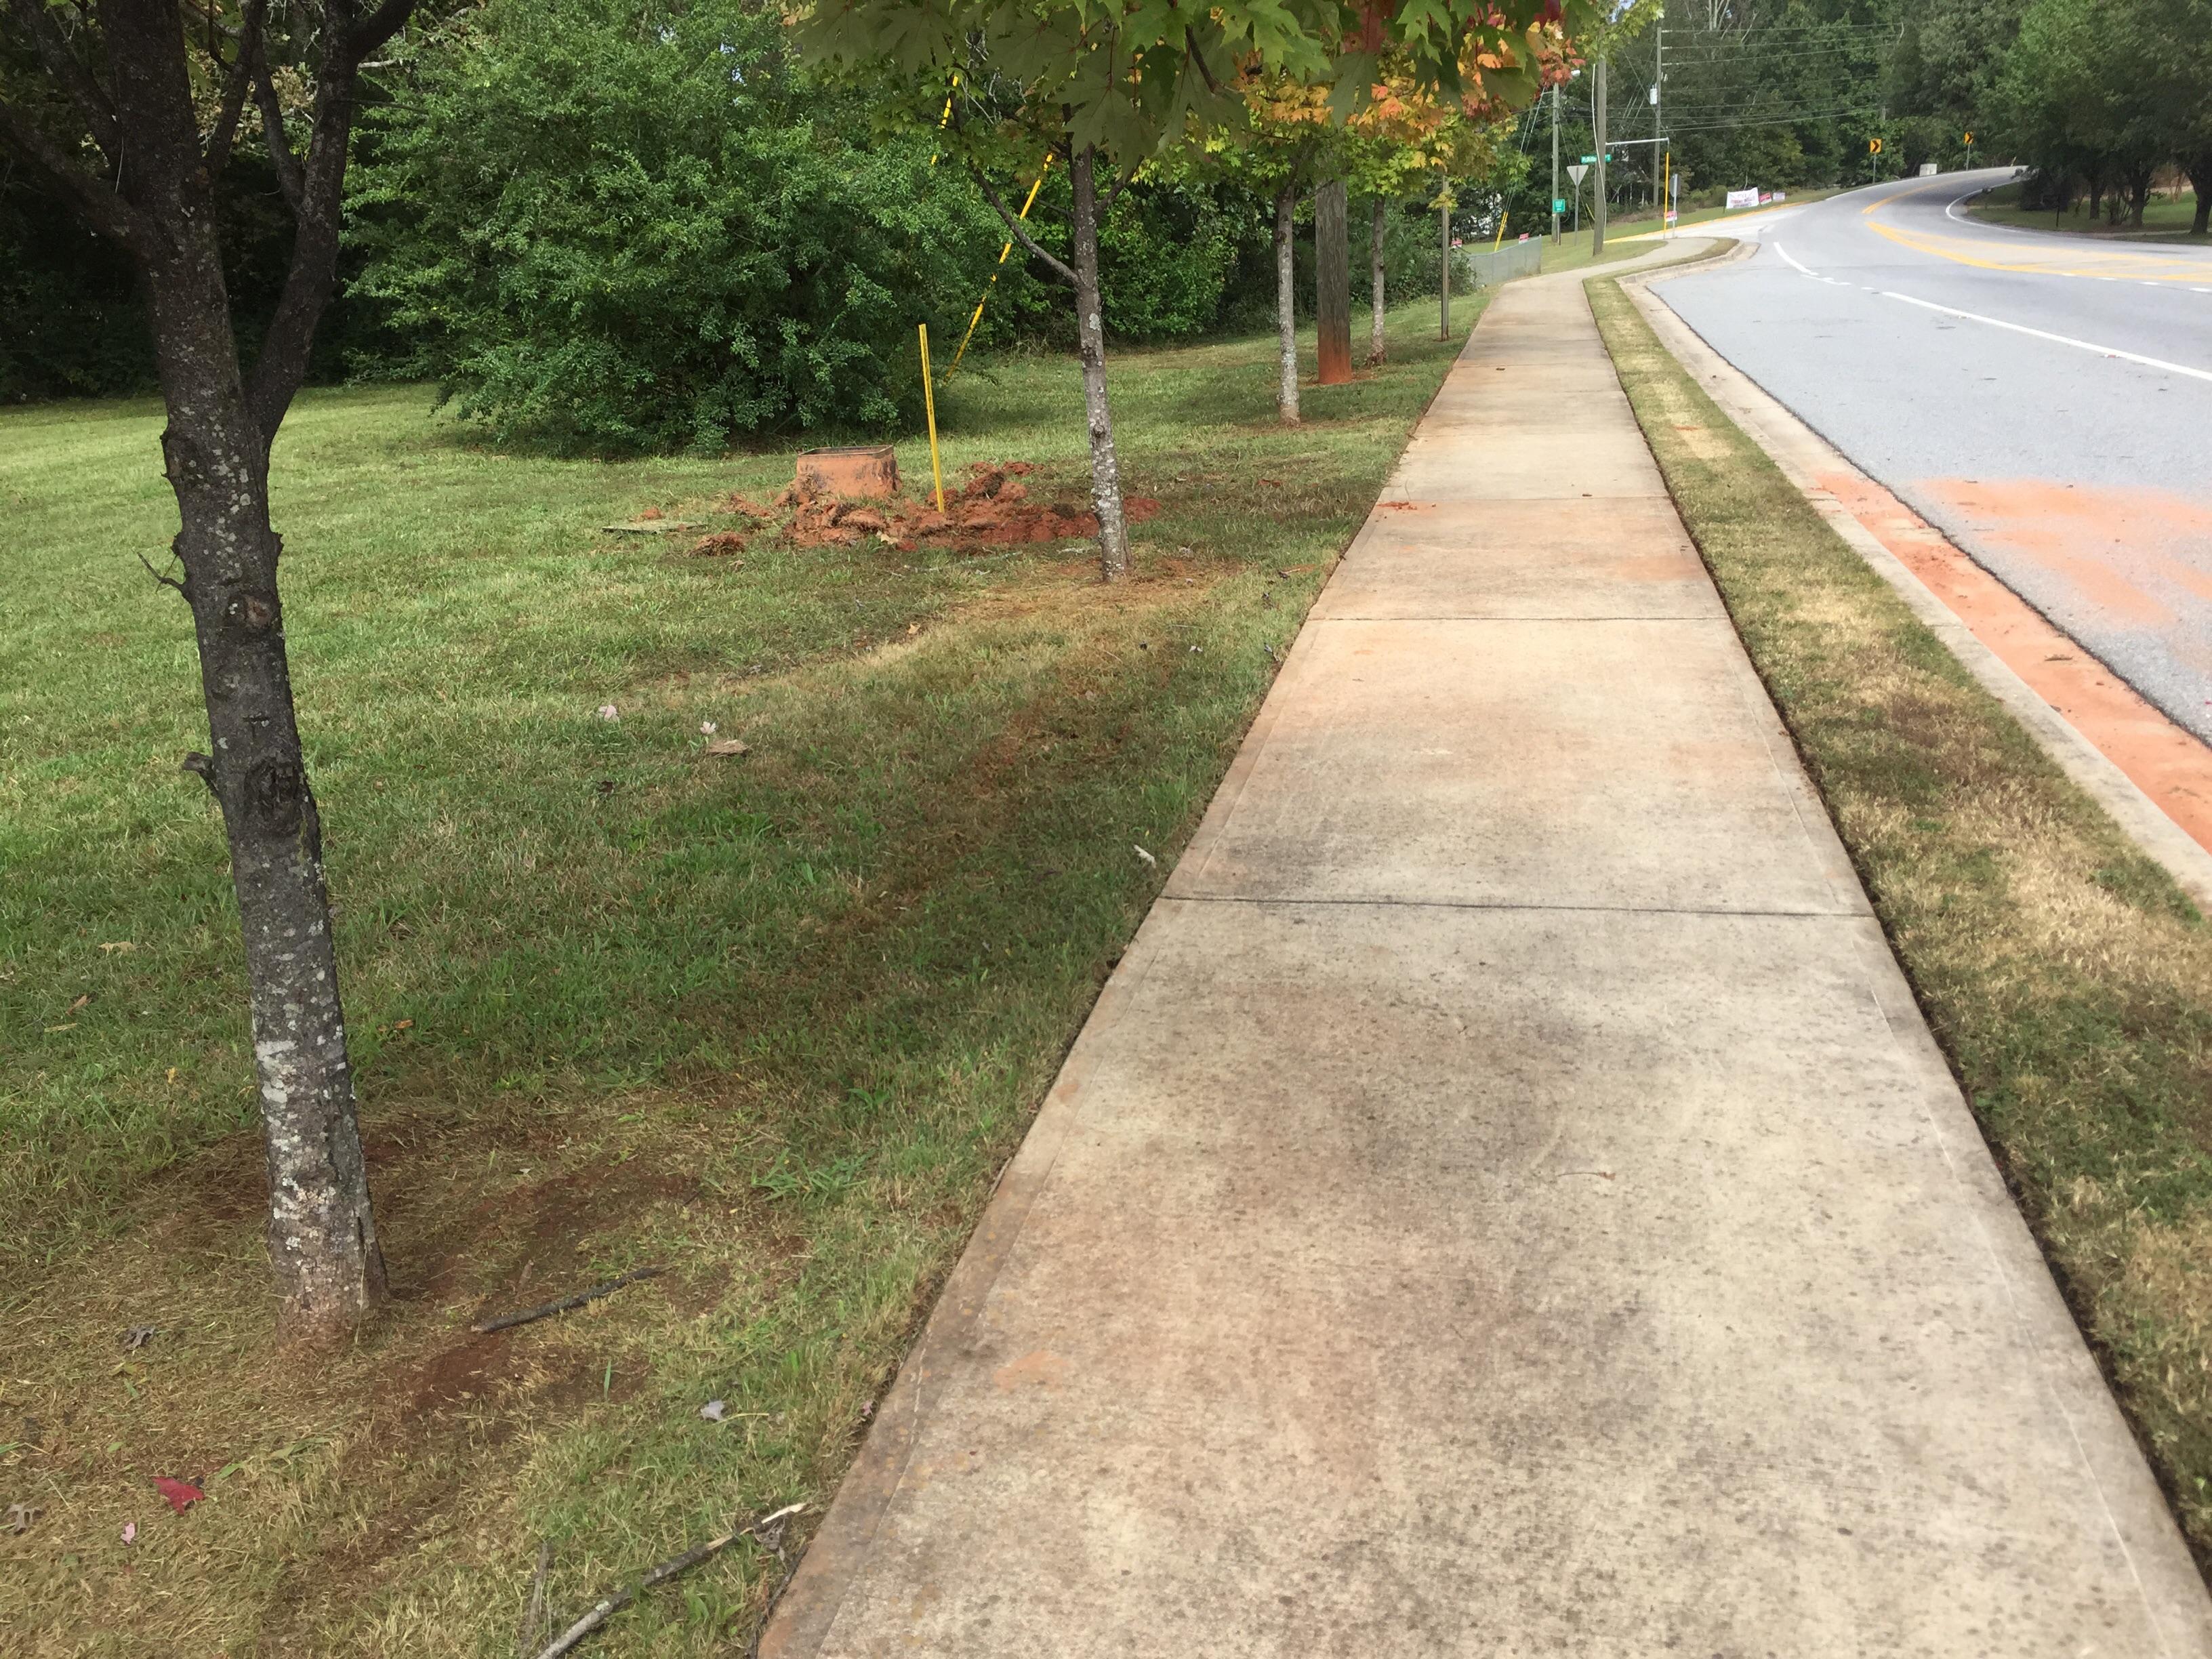 Lawn Care Service in Lawrenceville, GA, 30043